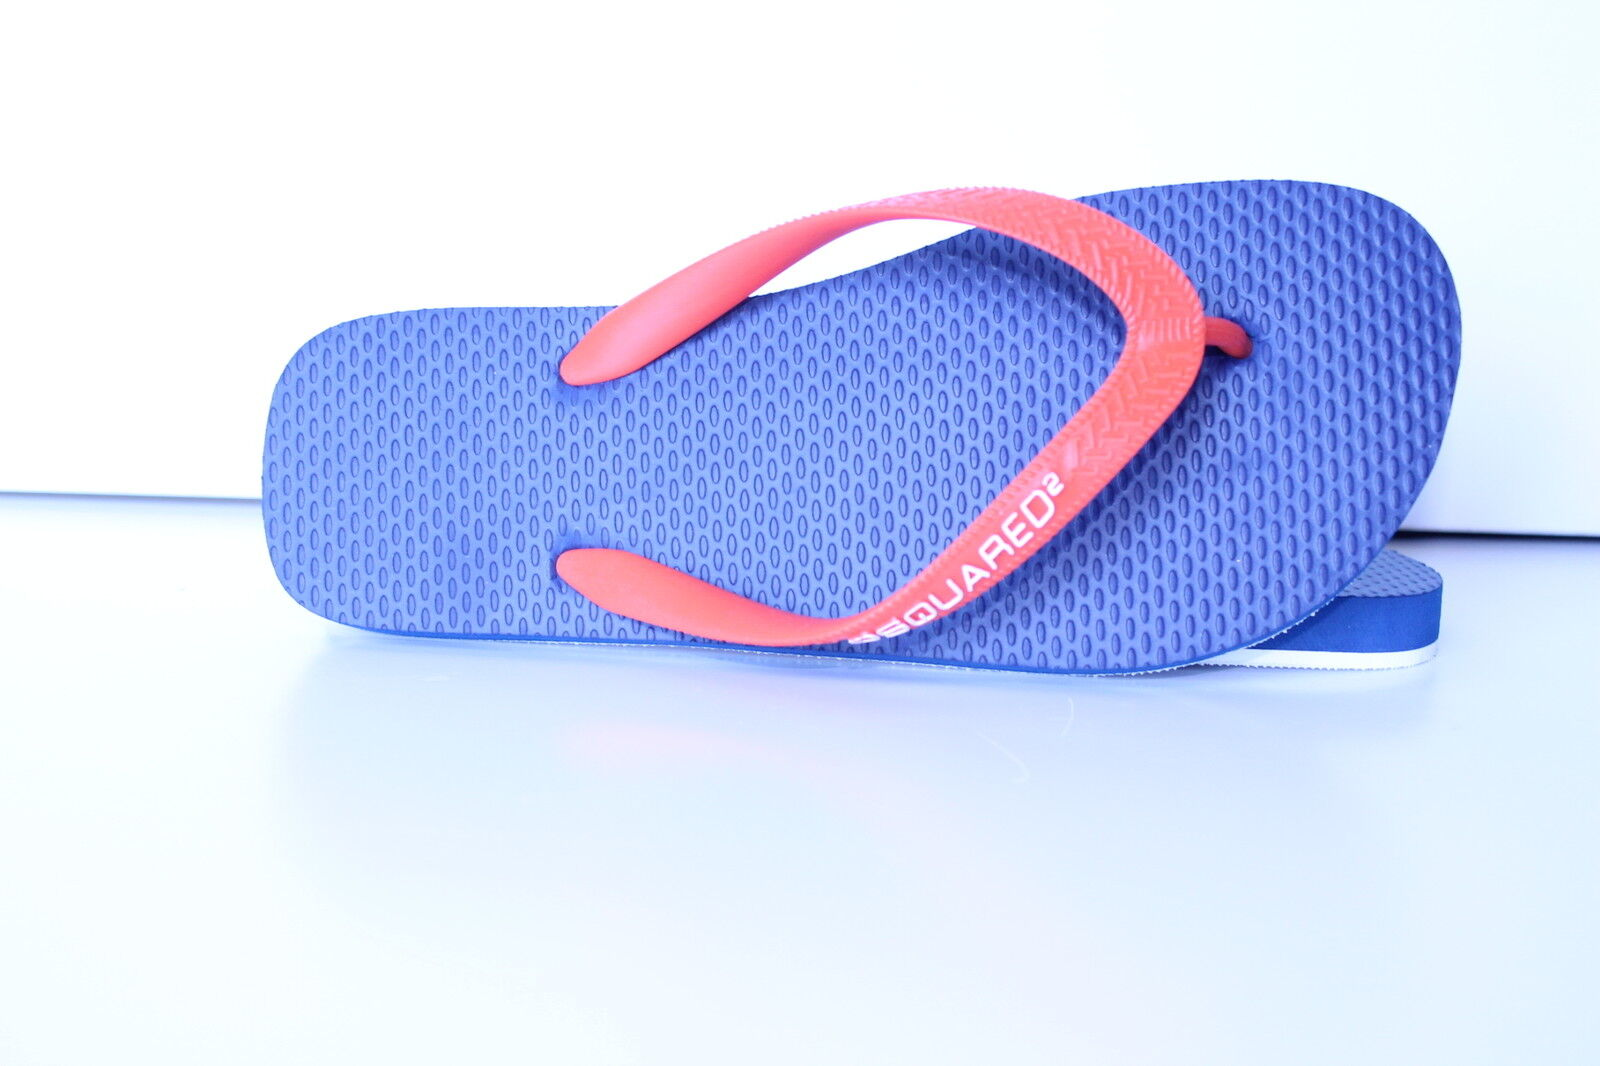 1) Dsquarojo2 infradito arancio con fondo azul.